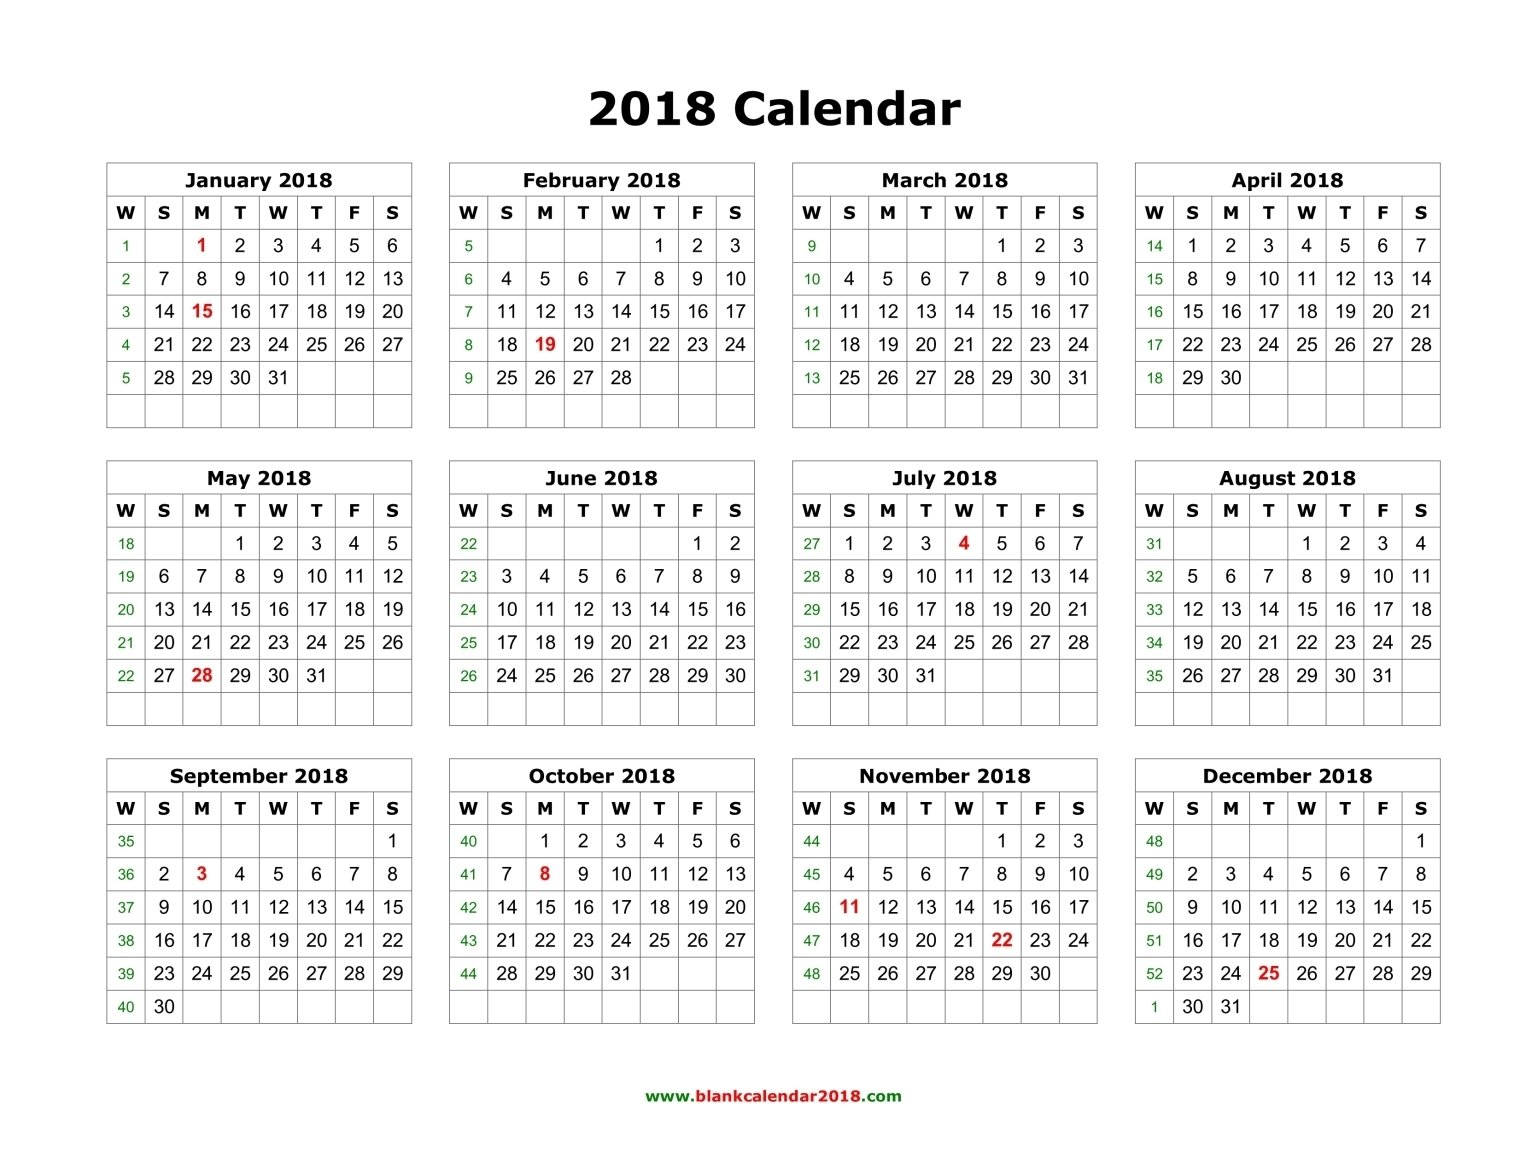 Blank Calendar 2018 Landscape Print Free Calendars Without Downloading 2018